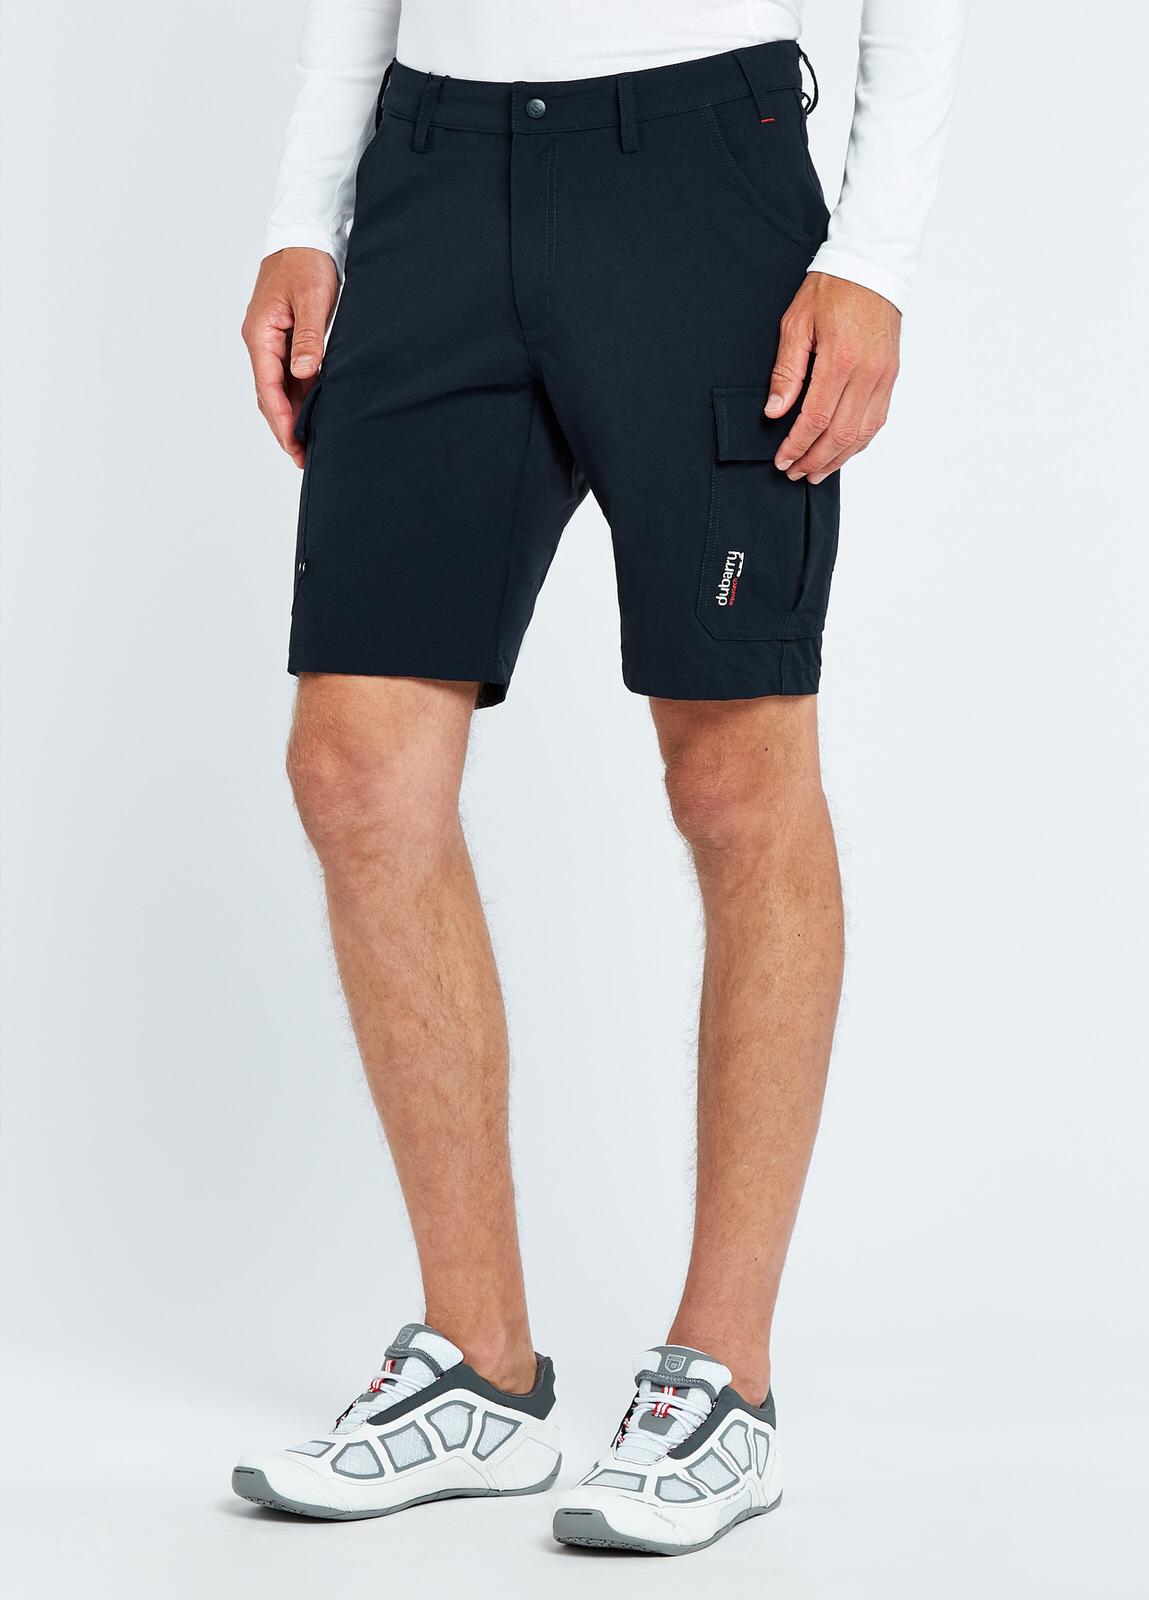 Imperia Mens Technical Shorts - Navy